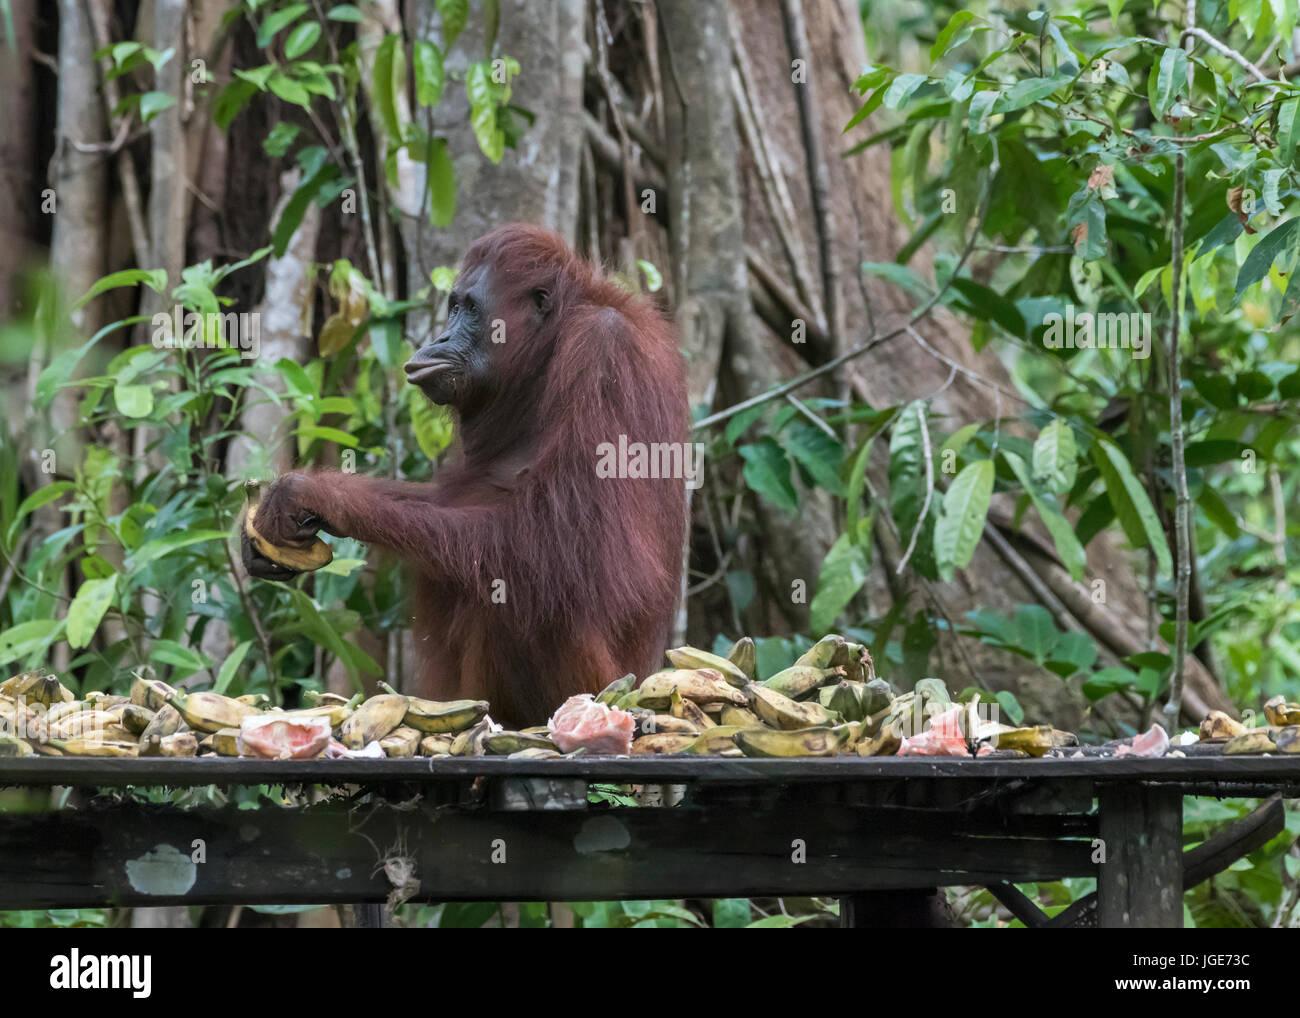 Adolescente orangutan in corrispondenza di una stazione di alimentazione, Tanjung messa NP, Indonesia Immagini Stock